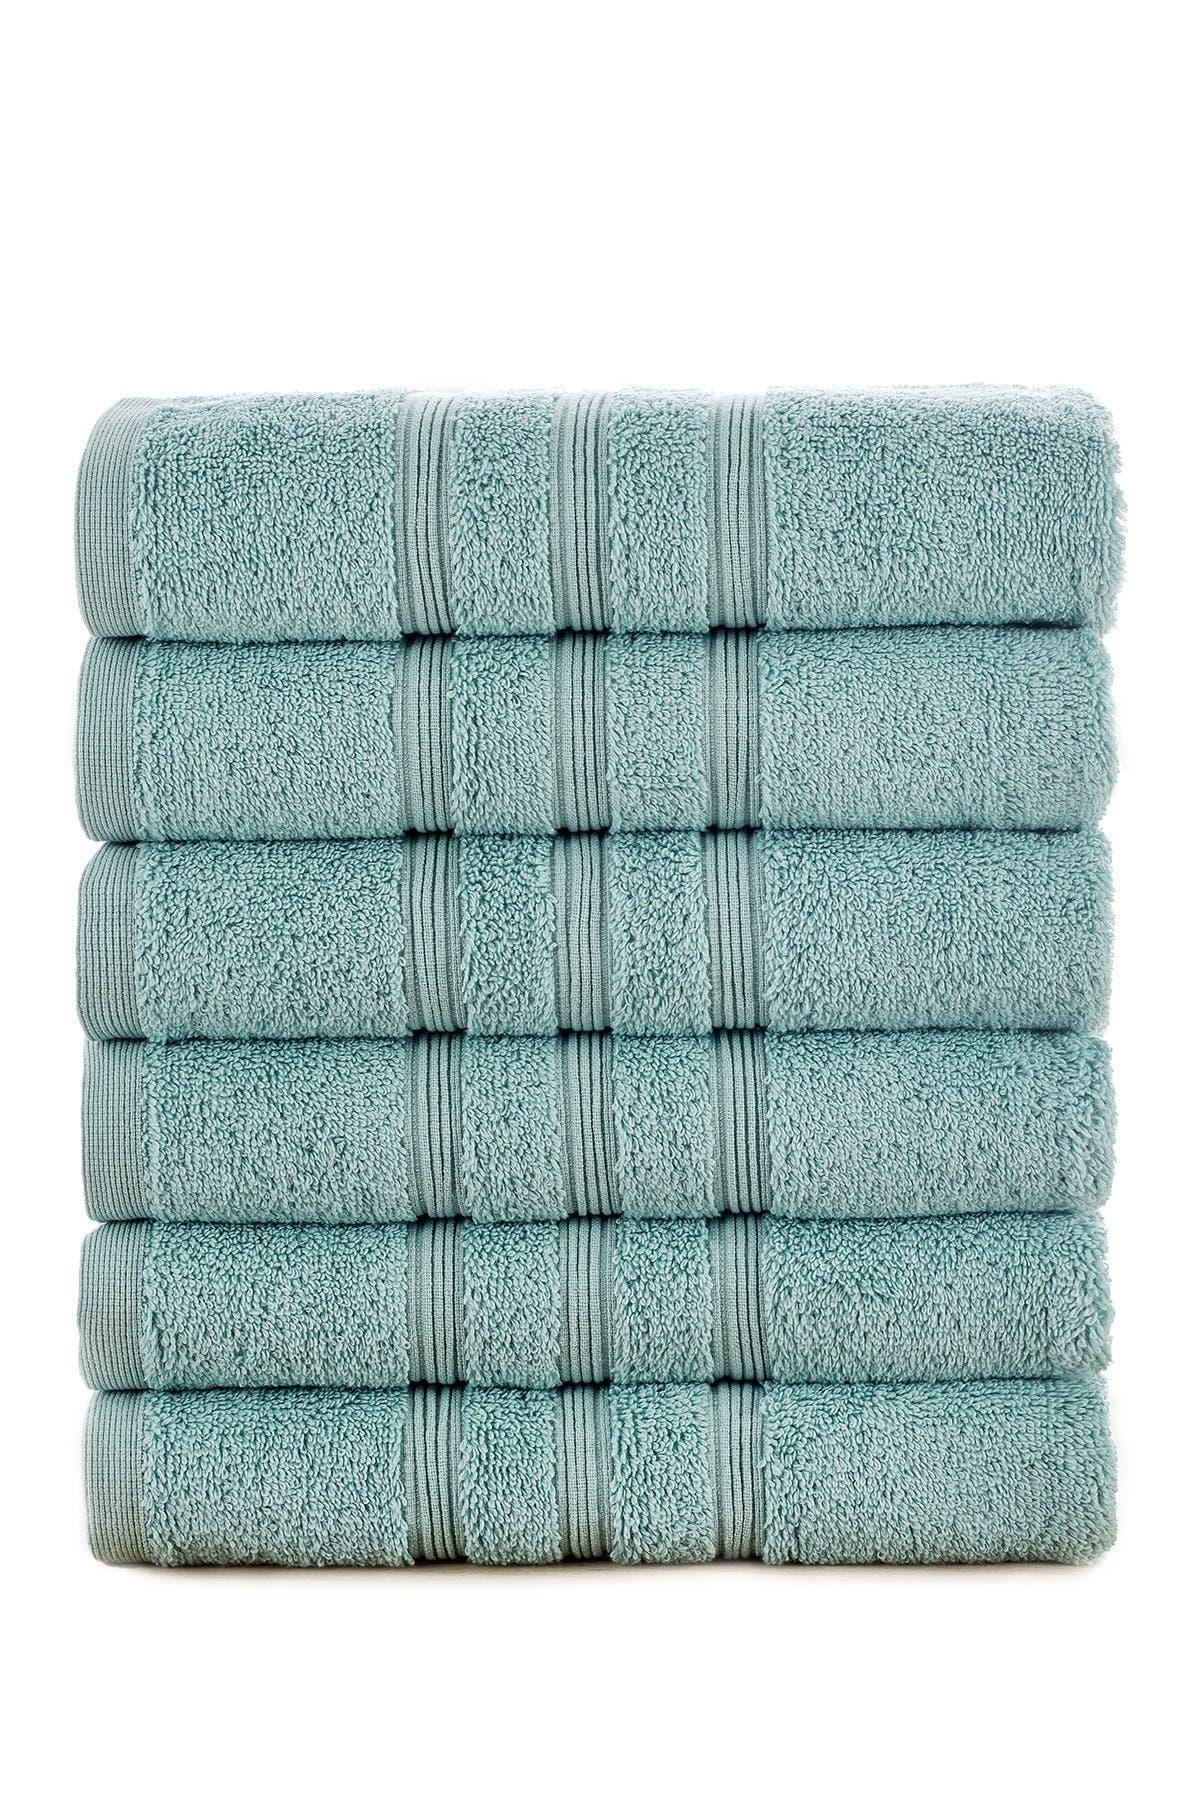 Image of Modern Threads Manor Ridge Turkish Cotton 700 GSM Hand Towel - Set of 6 - Aqua